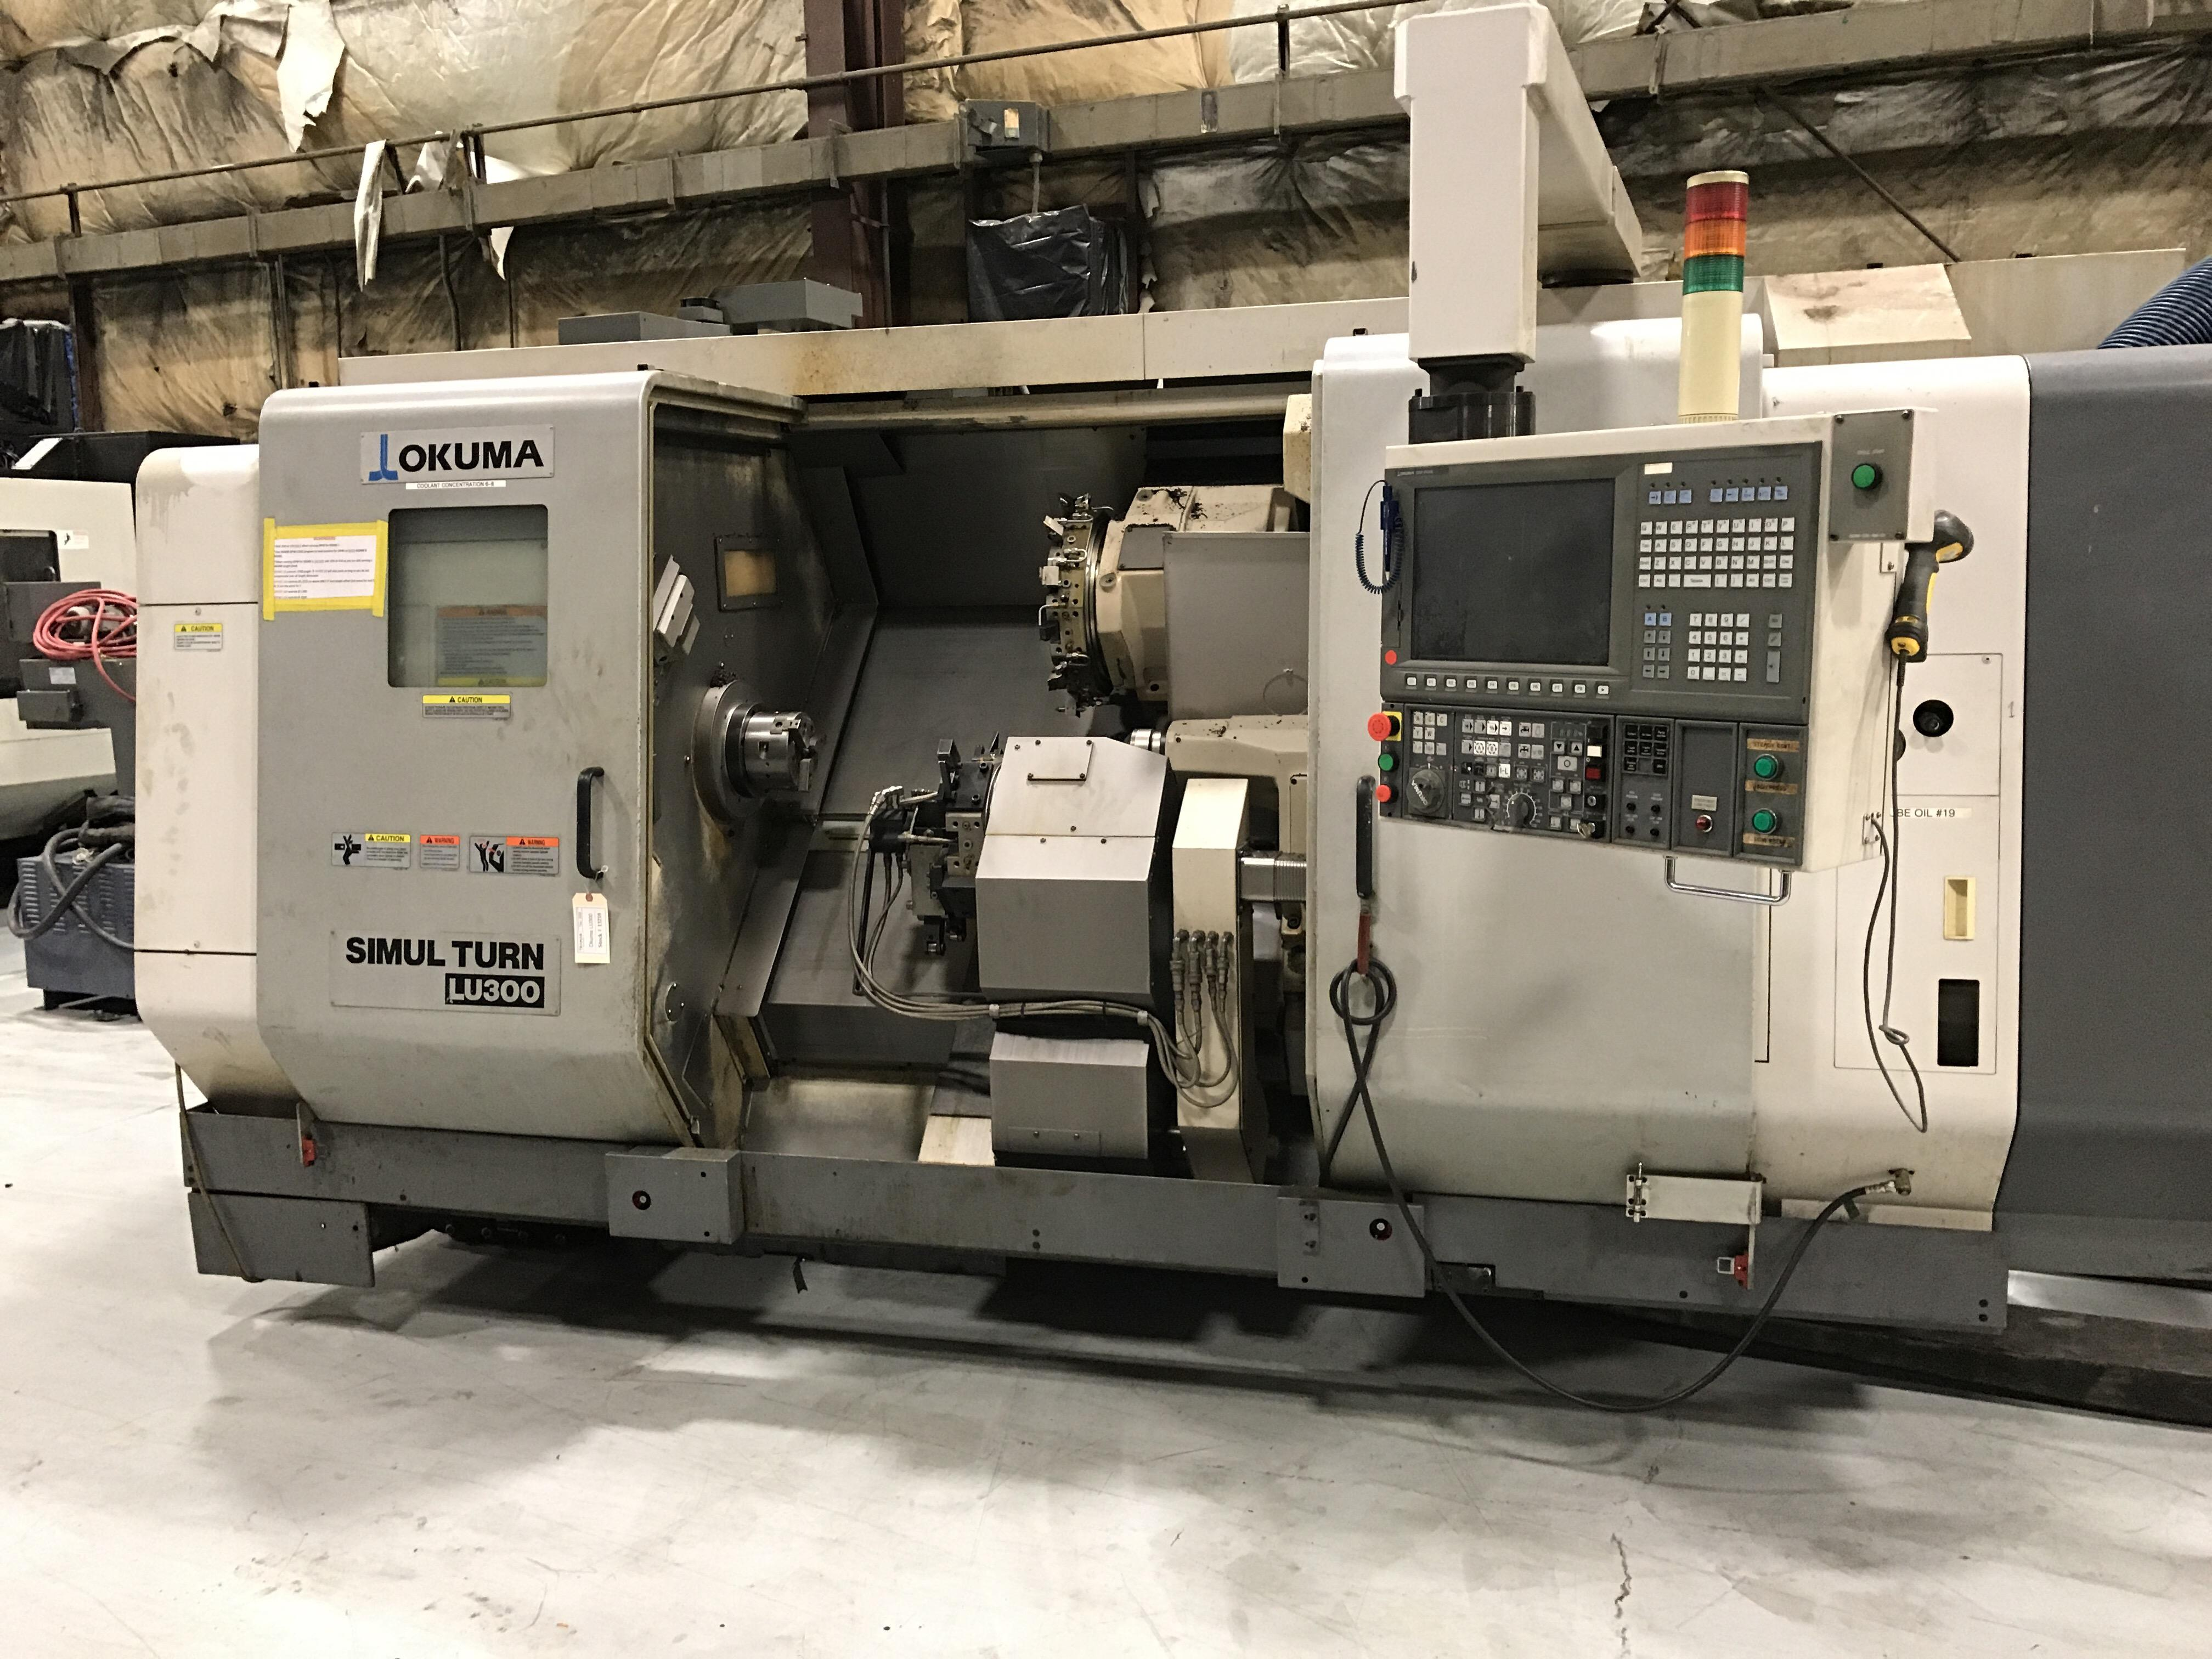 2009 OKUMA SimulTurn LU-300 - CNC Horizontal Lathe